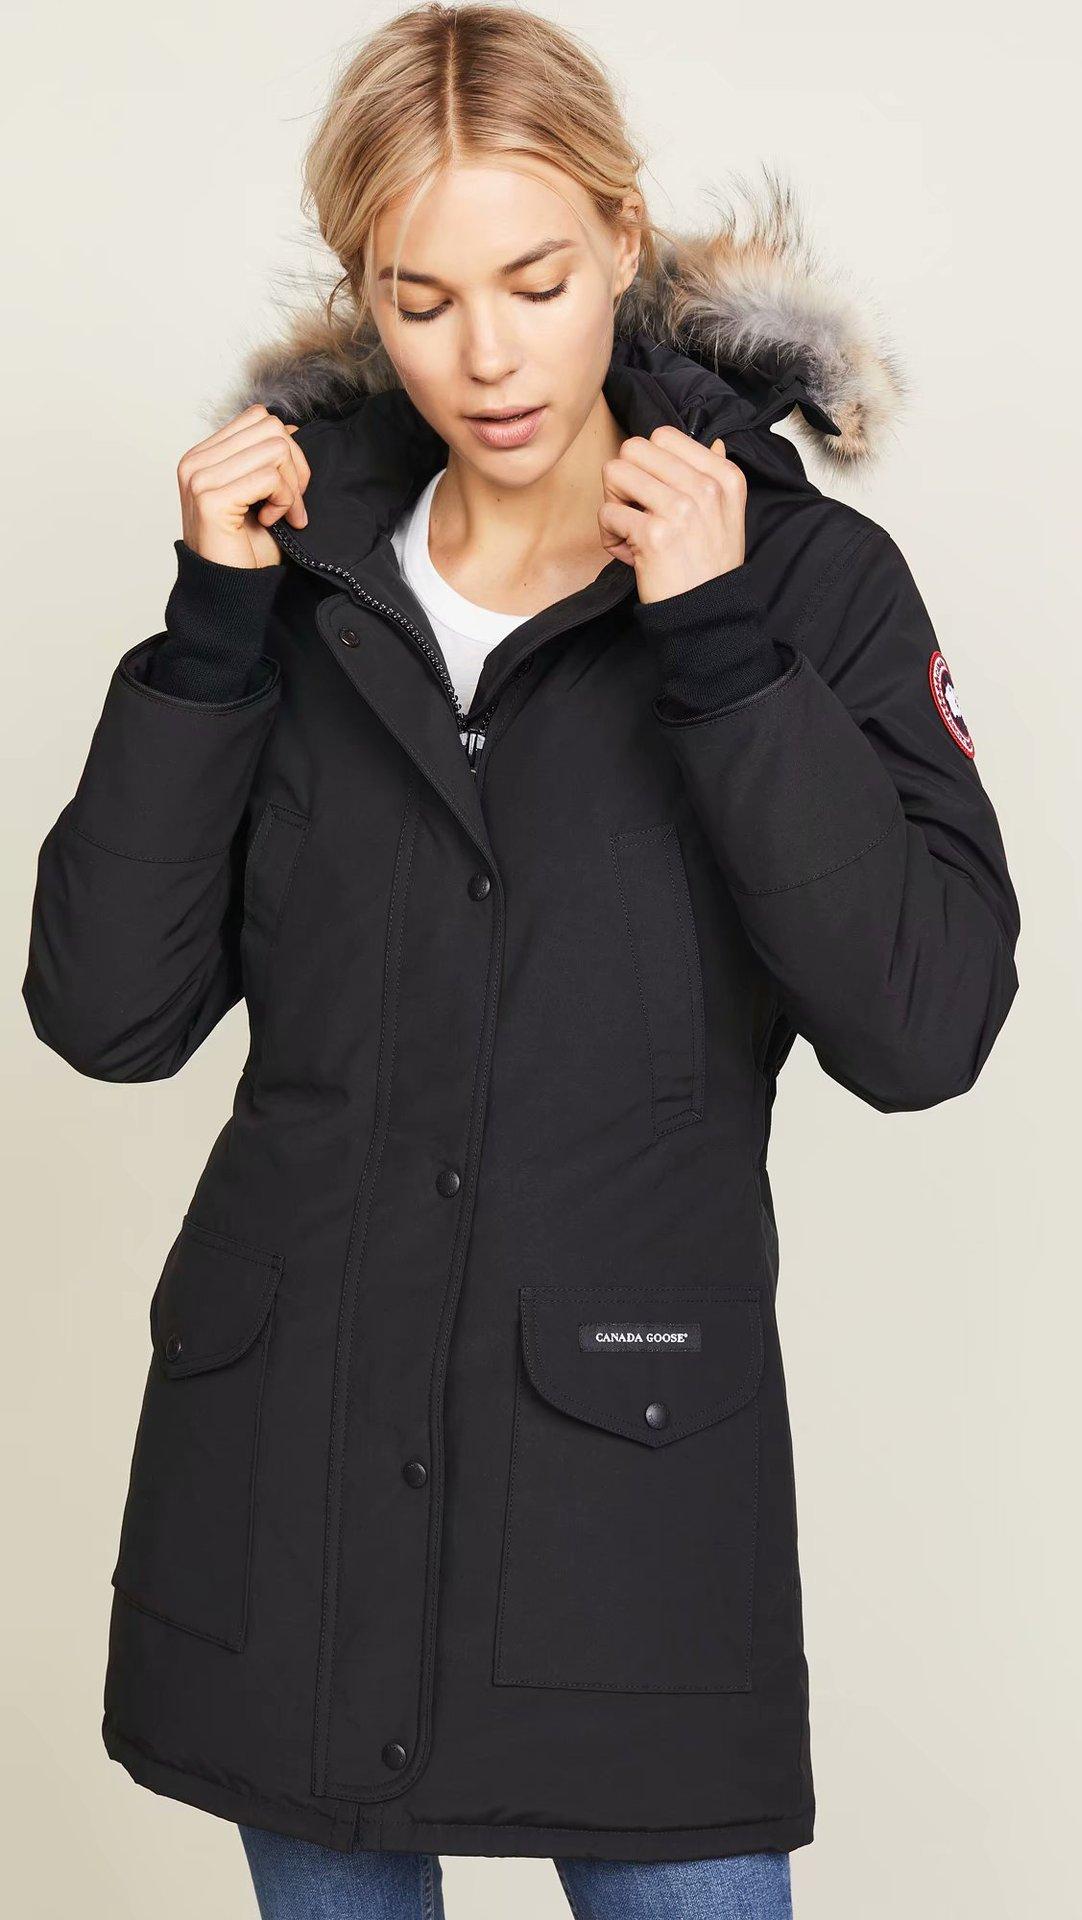 Polyester Fashioncoat(black-L) NHAM5894-black-L